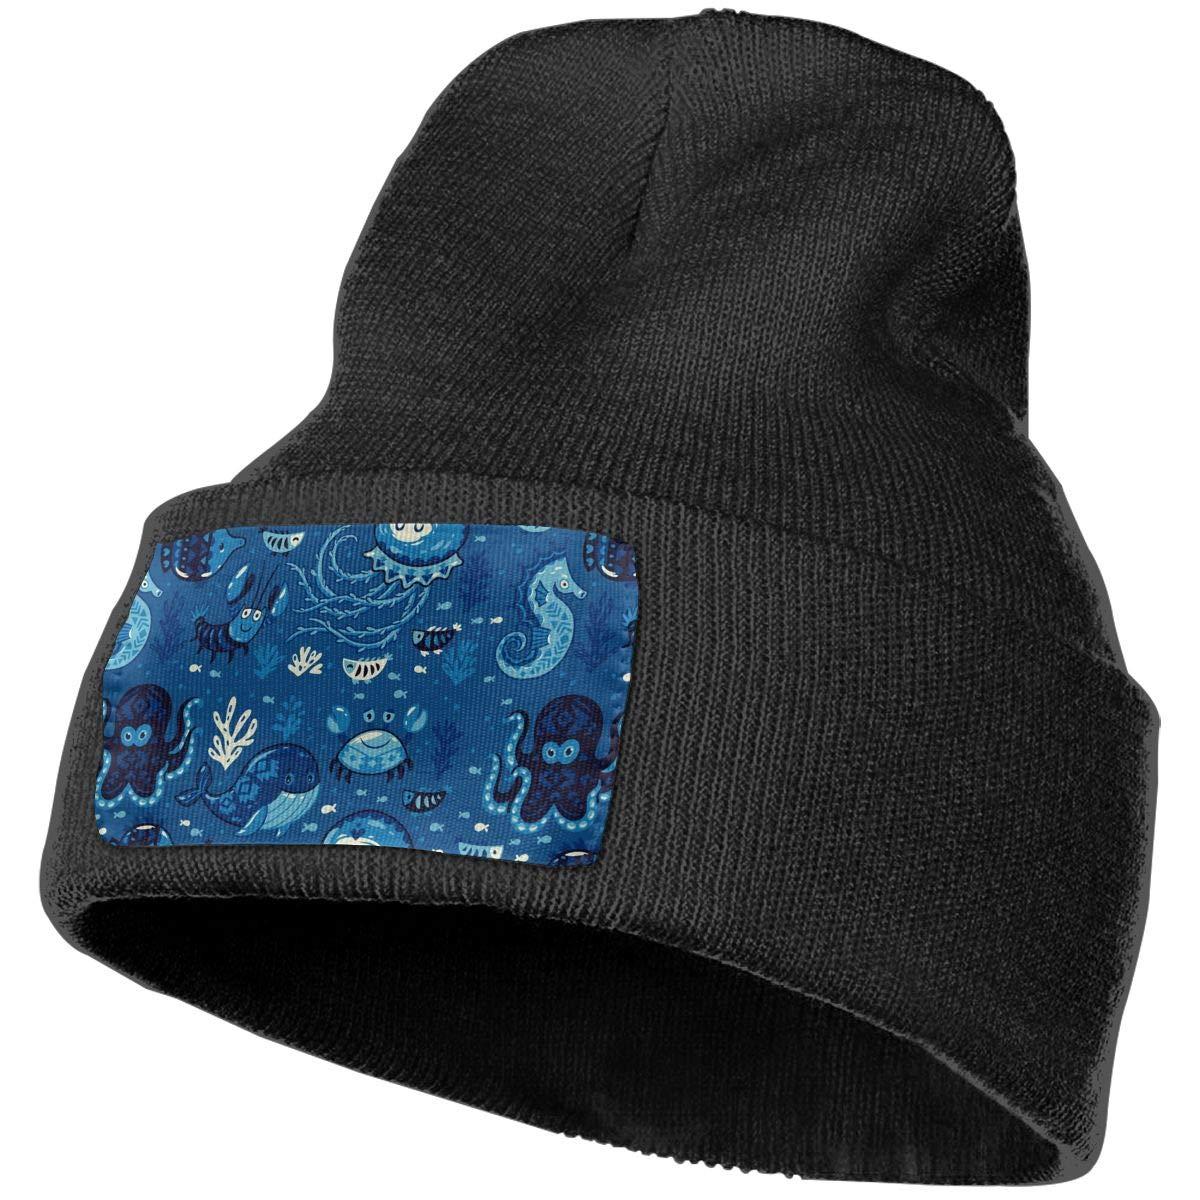 Horizon-t Sea Octopus Unisex 100/% Acrylic Knitting Hat Cap Fashion Beanie Hat